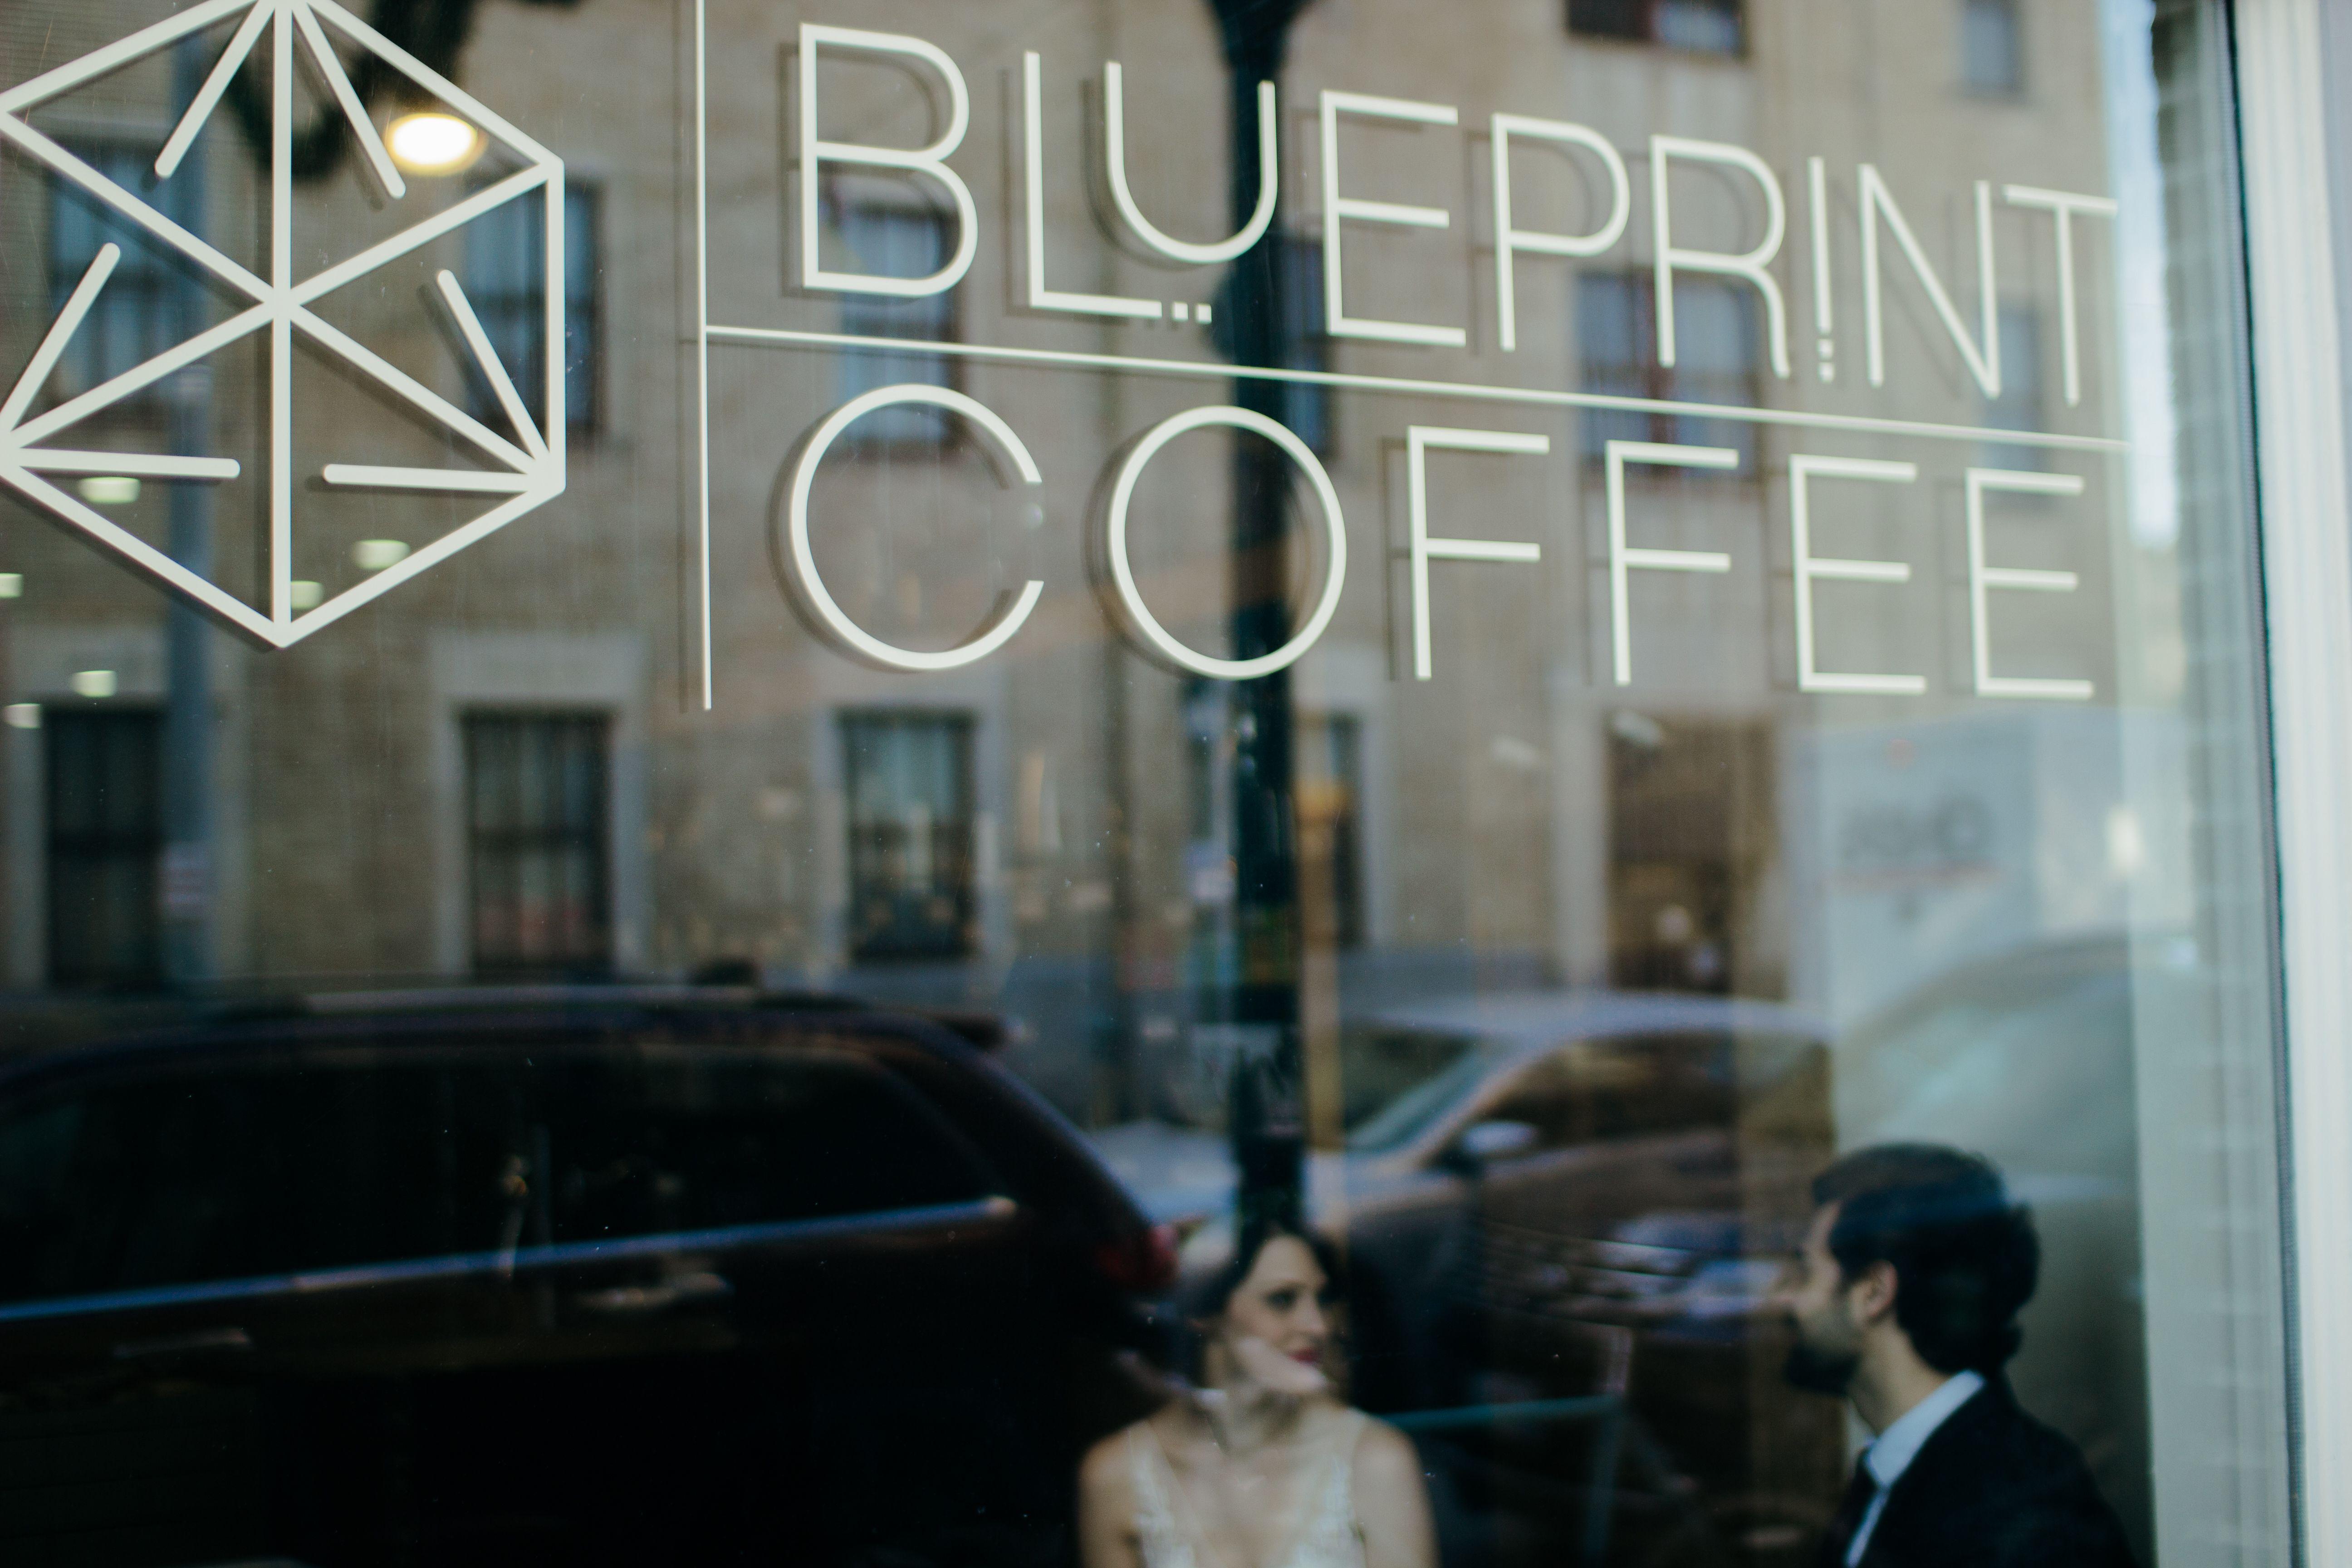 Josh and lacey wedding st louis missouri blueprint coffee josh and lacey wedding st louis missouri blueprint coffee malvernweather Image collections